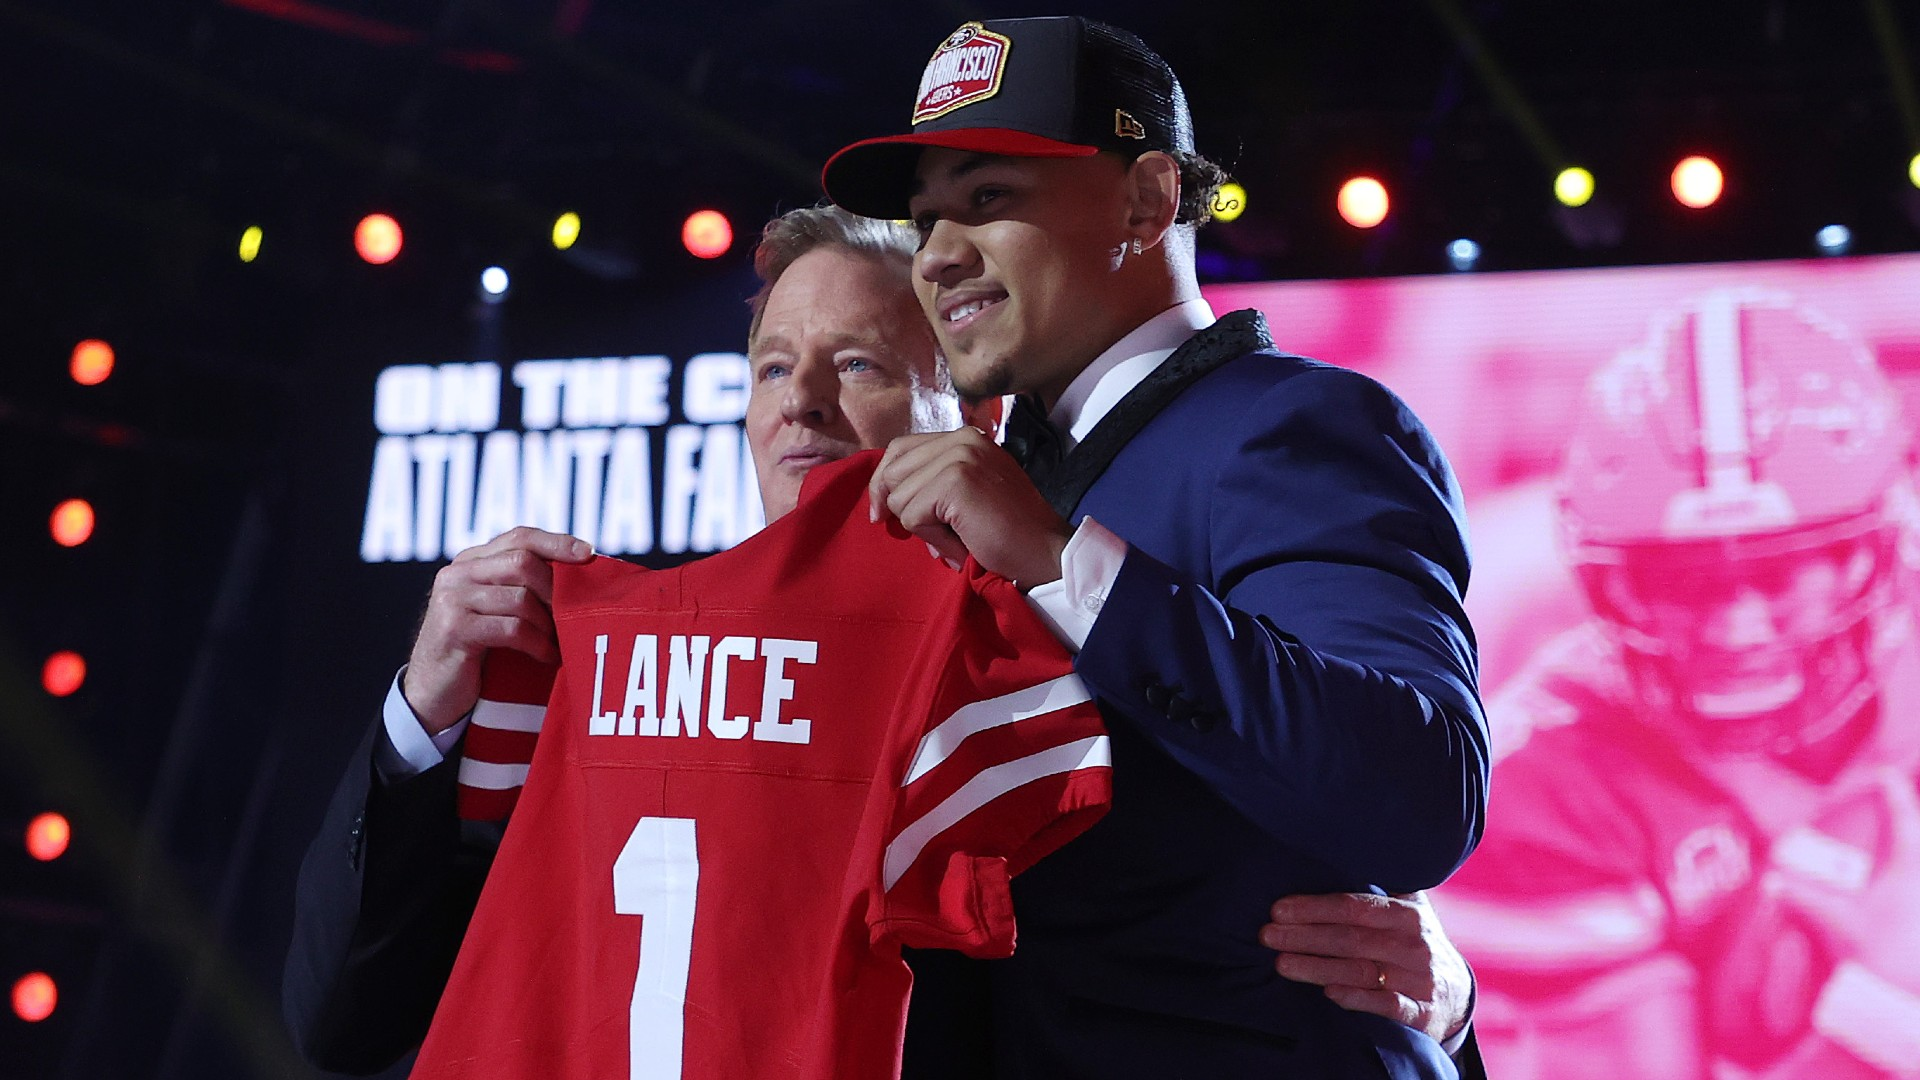 Kyle Shanahan explains why 49ers picked Trey Lance over Mac Jones in 2021 NFL Draft